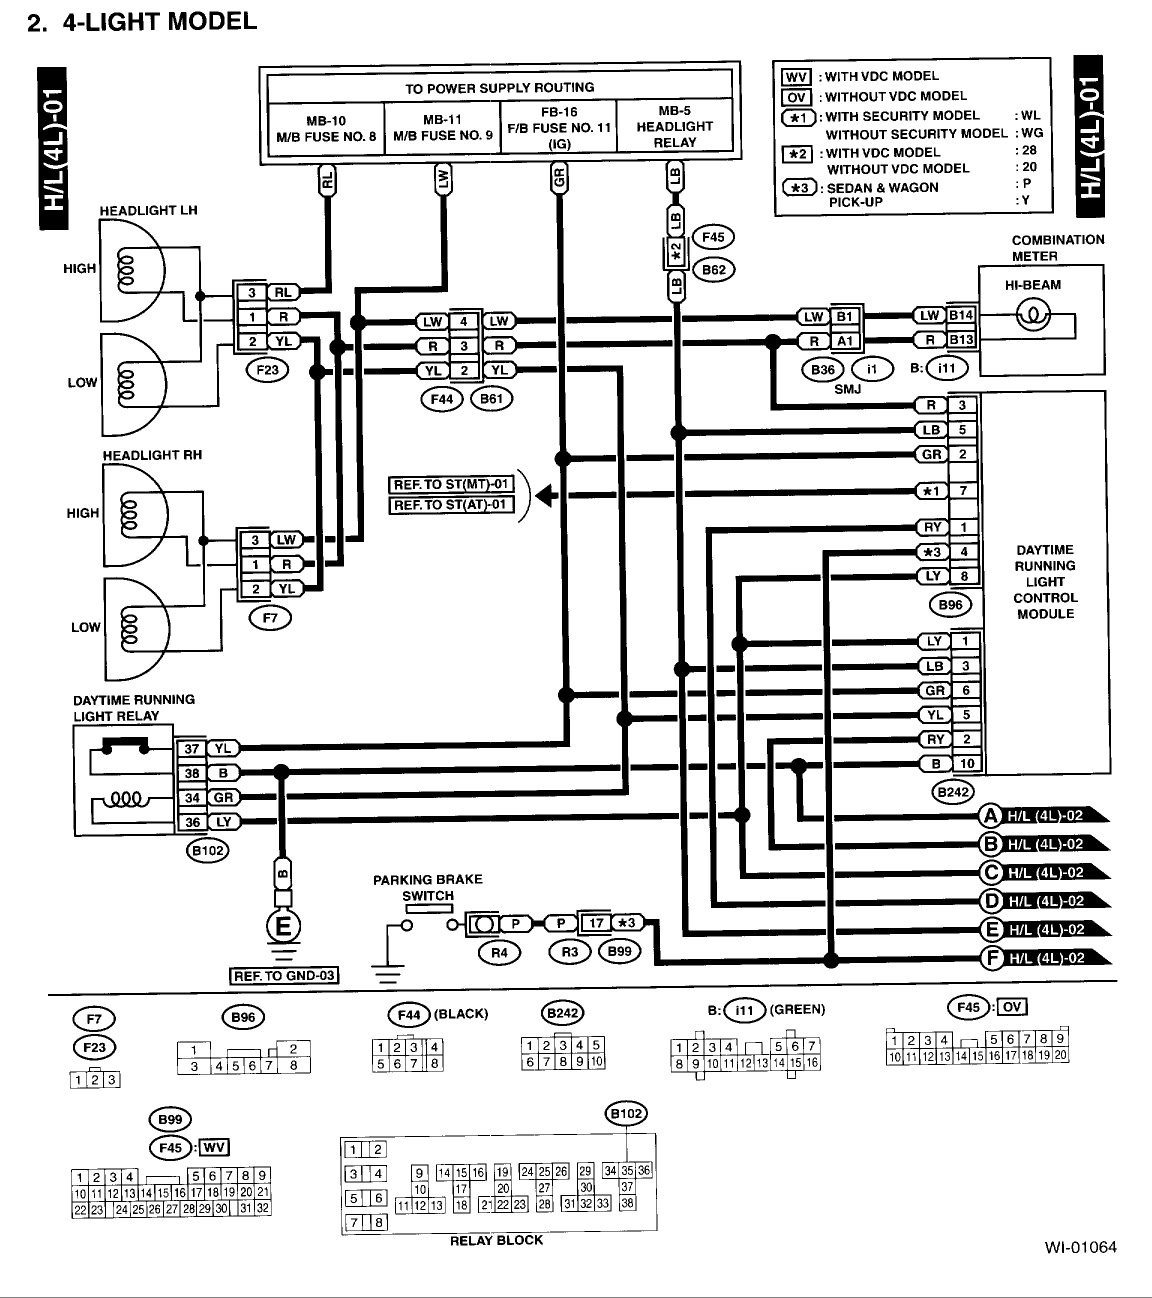 2004 subaru outback electrical wiring diagram - wiring diagram  suit-explorer - suit-explorer.pmov2019.it  pmov2019.it